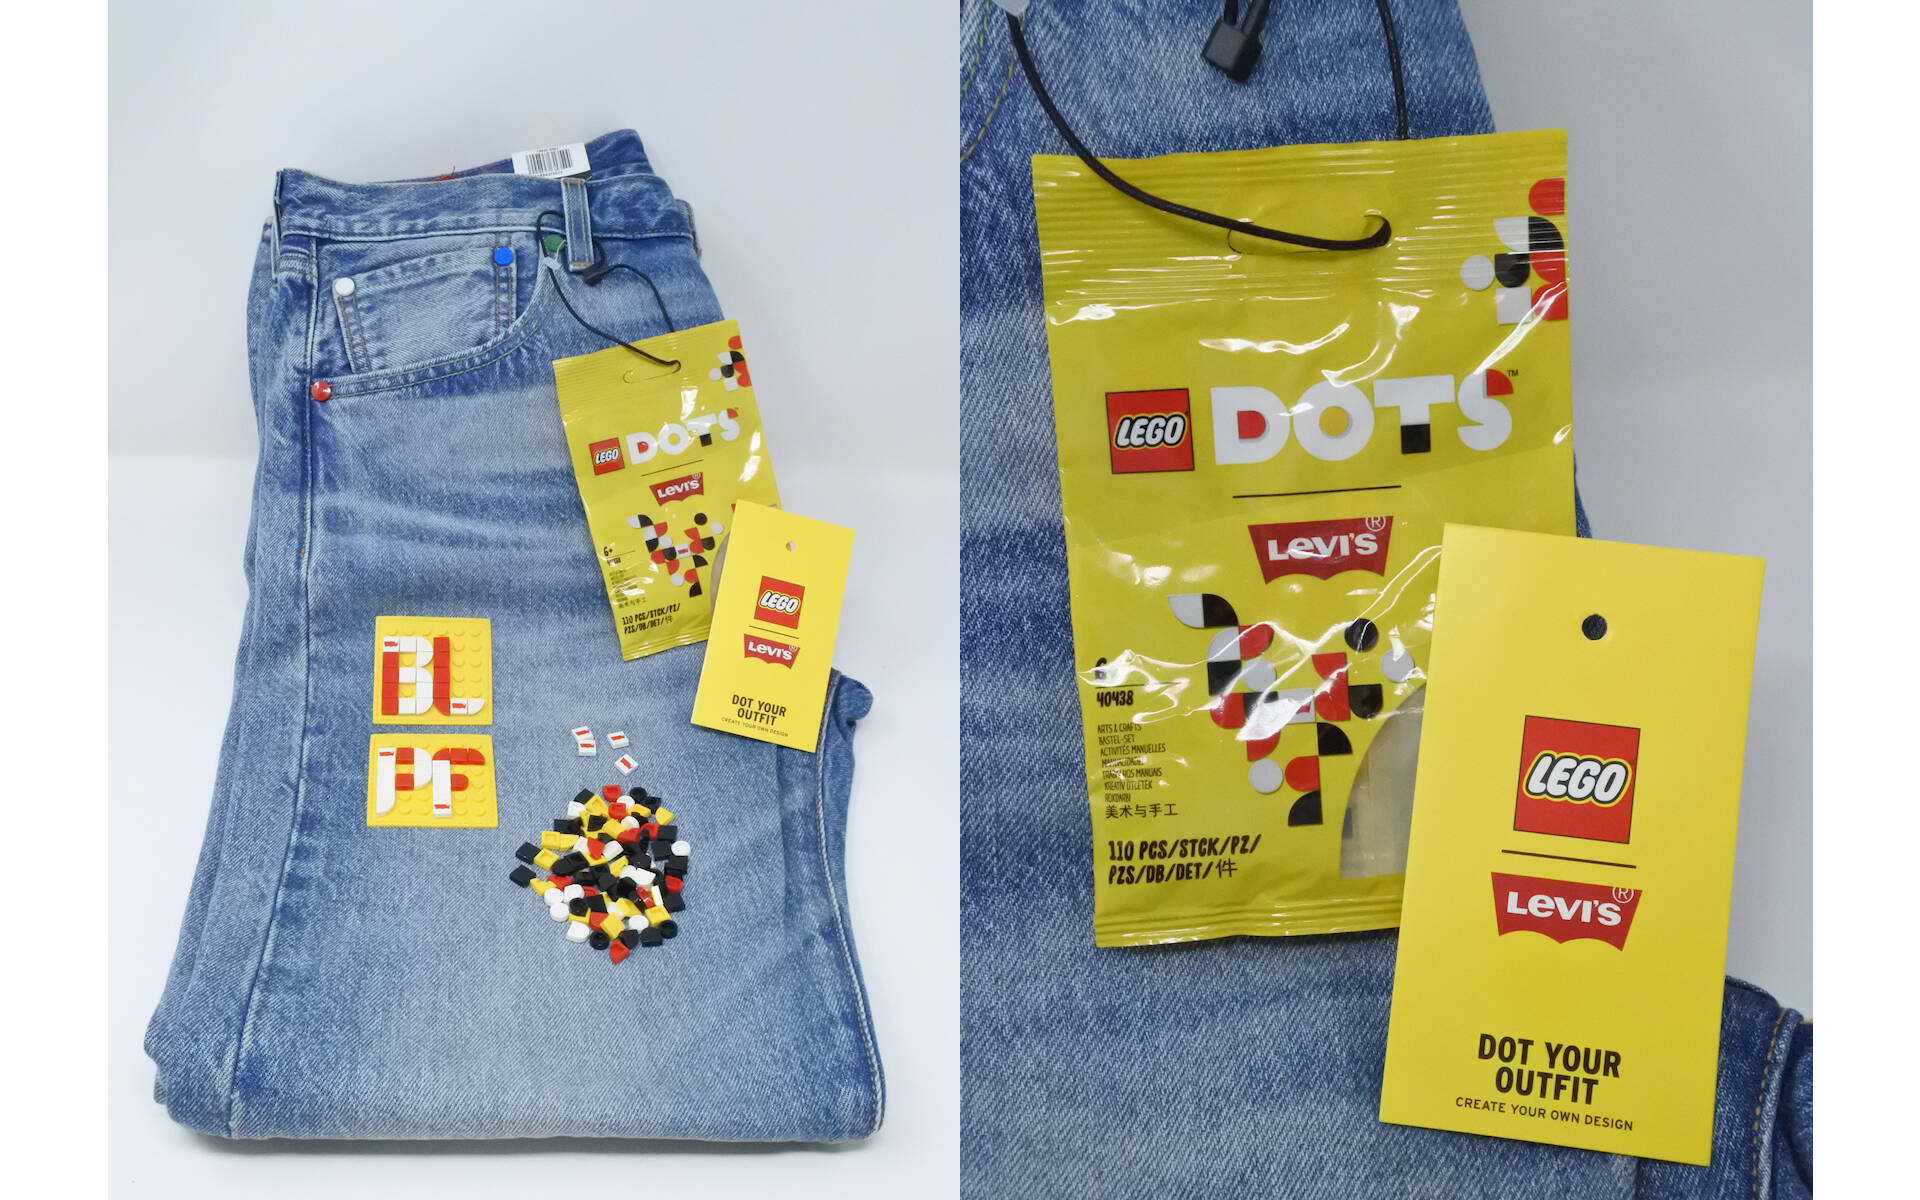 LEVI's LEGO DOTS